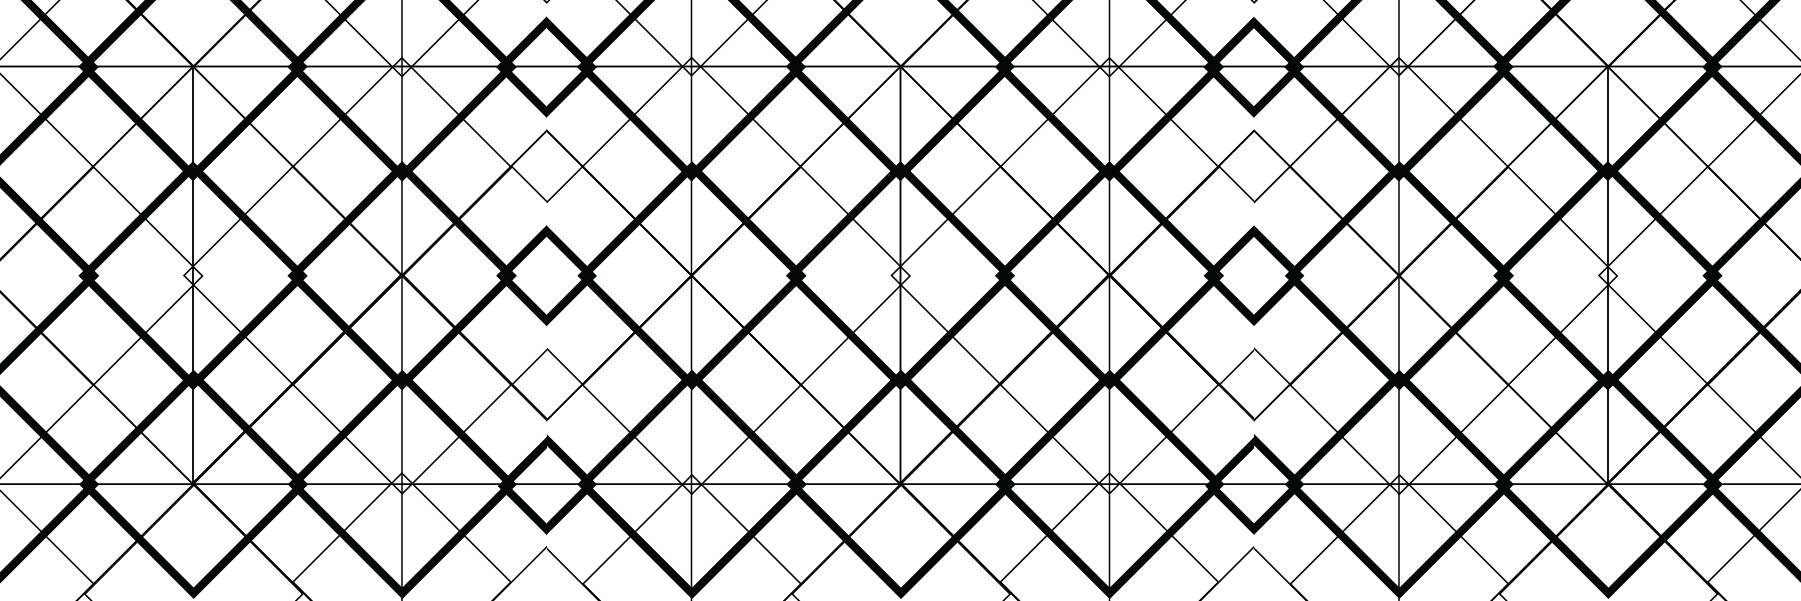 banner_Boxy Brand pattern-01.png